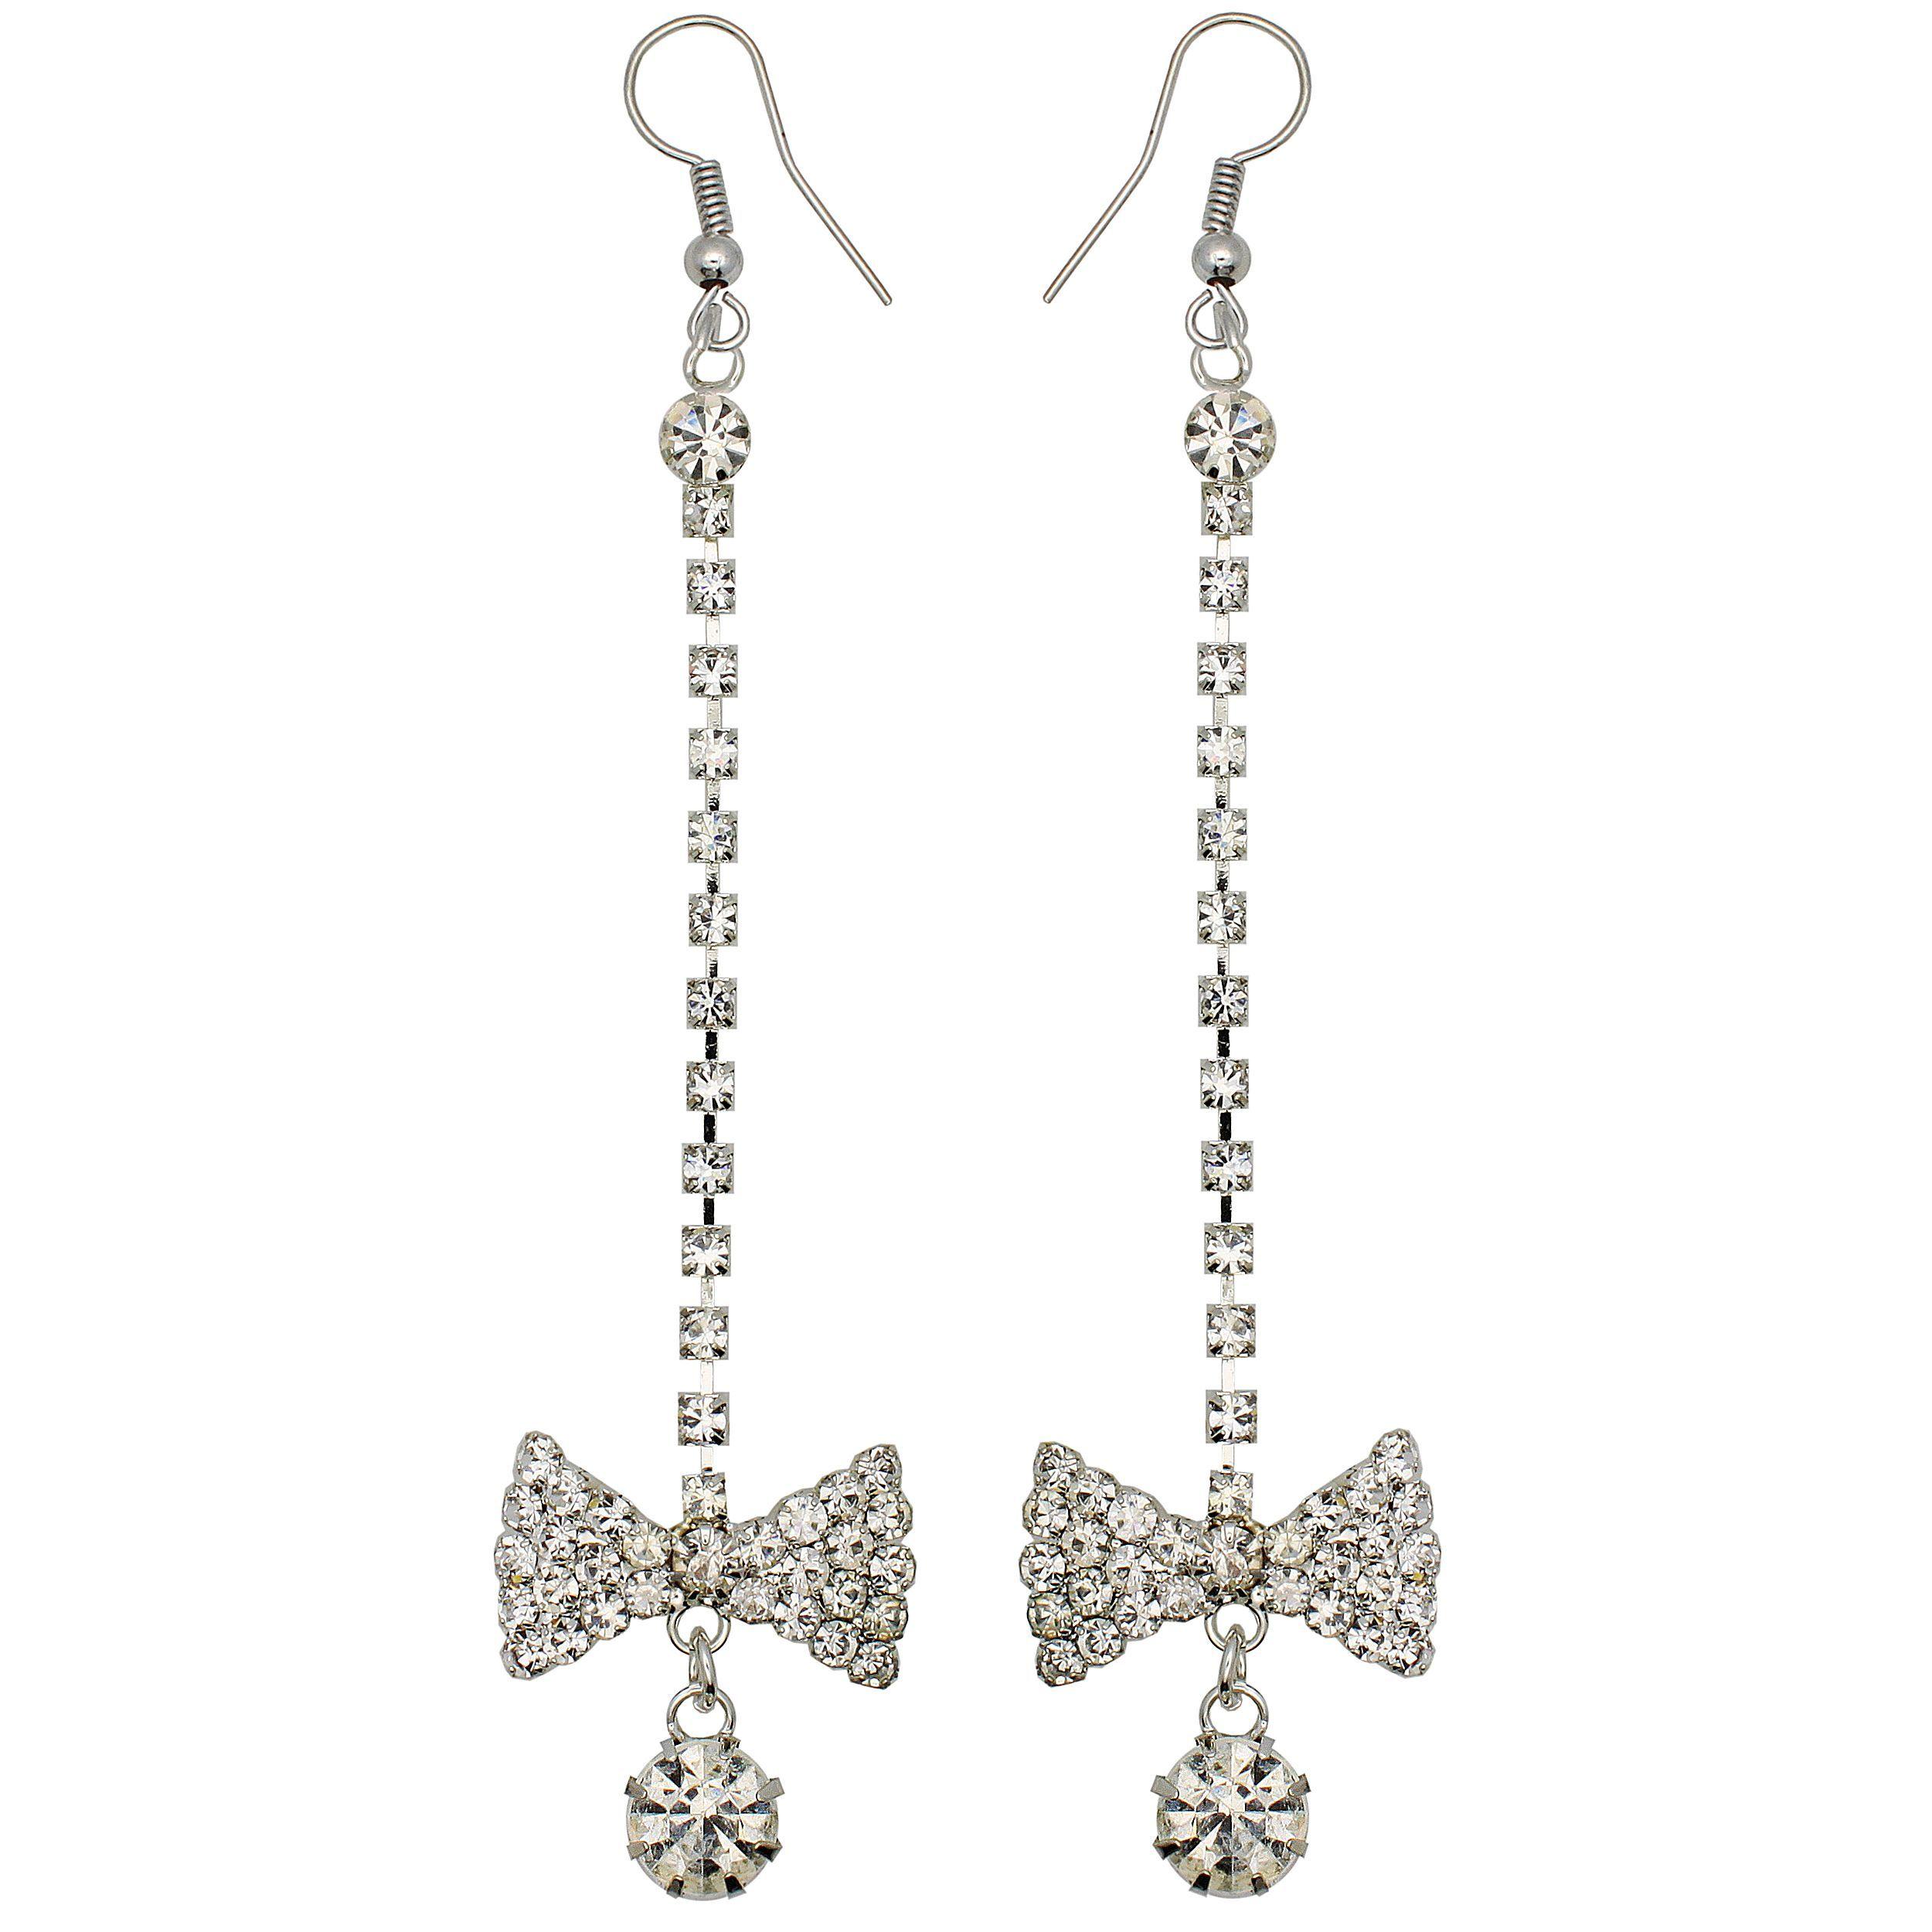 Kate Marie tone Rhinestone Bow Design Earrings, Women's